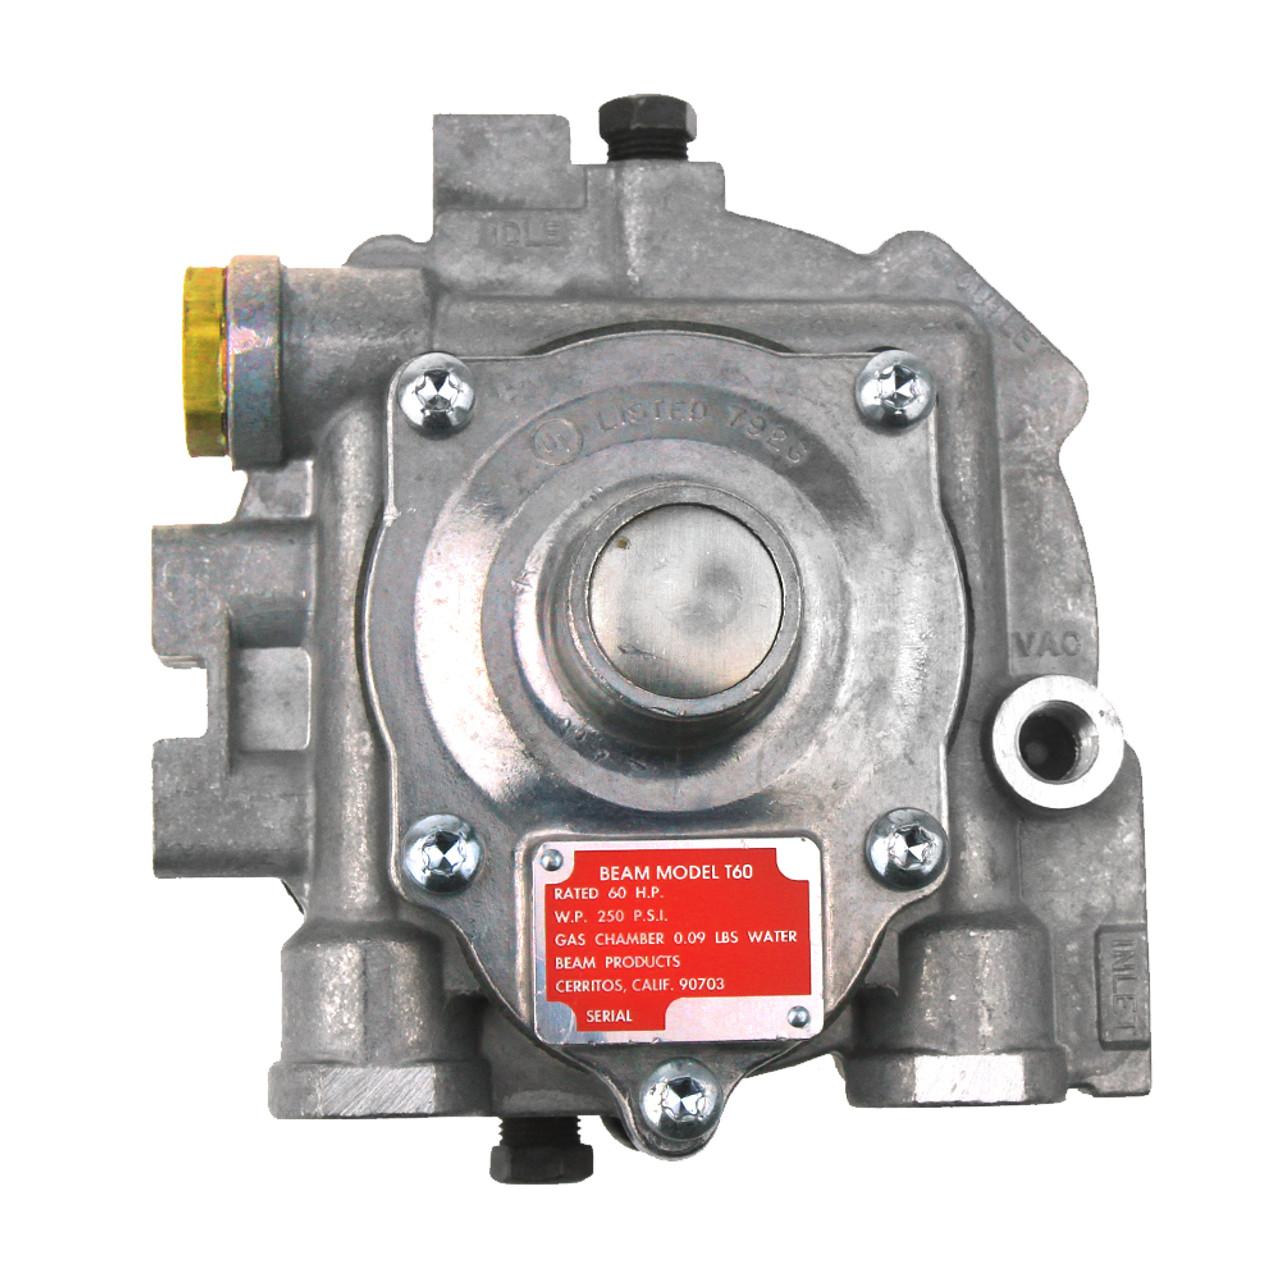 hight resolution of impco beam model t60 60 hp gas chamber propane forklift gas regulator